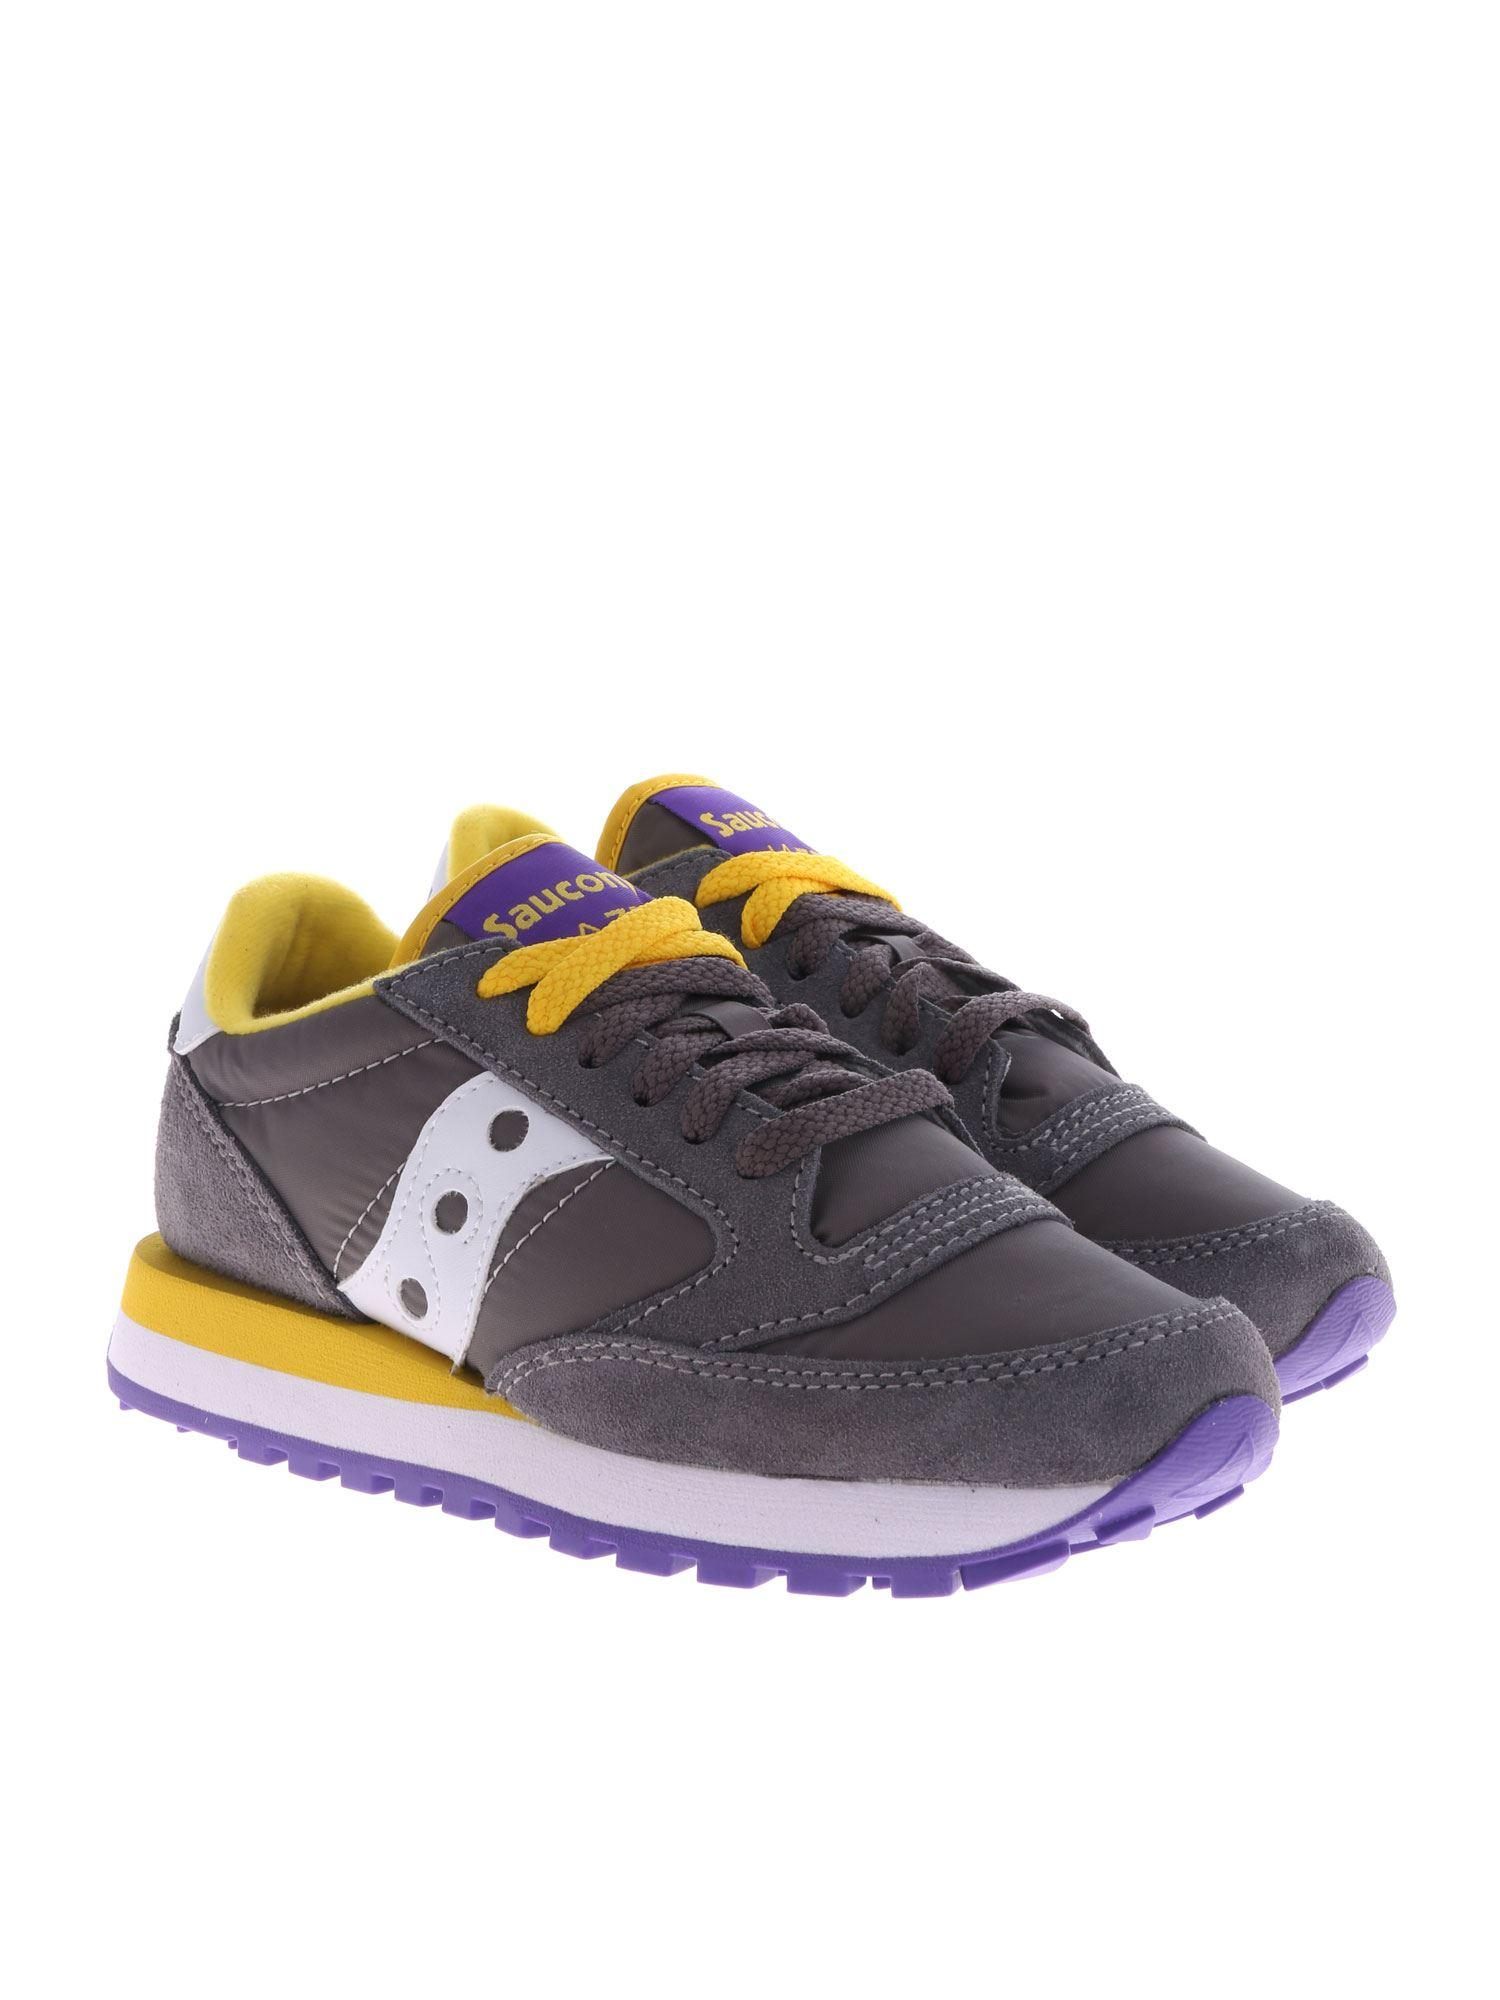 296d74a3a30d Lyst - Saucony Jazz Sneaker In Grey